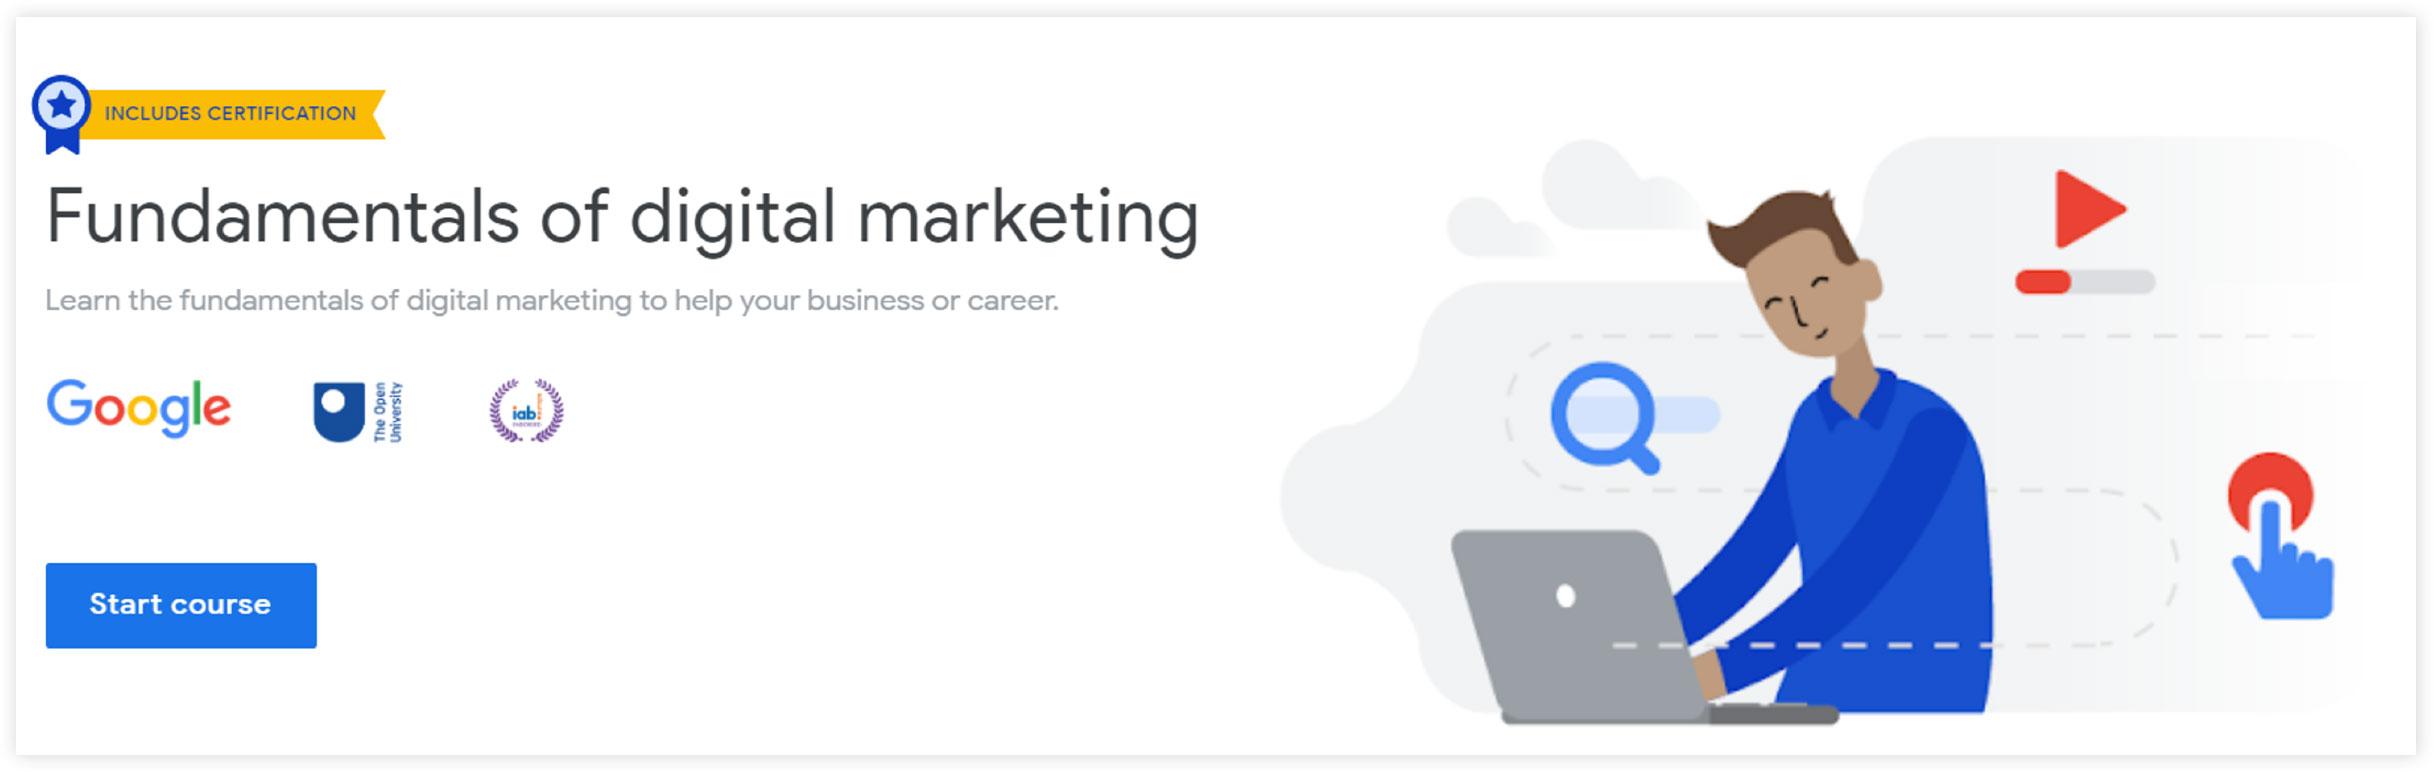 google digital marketing certification